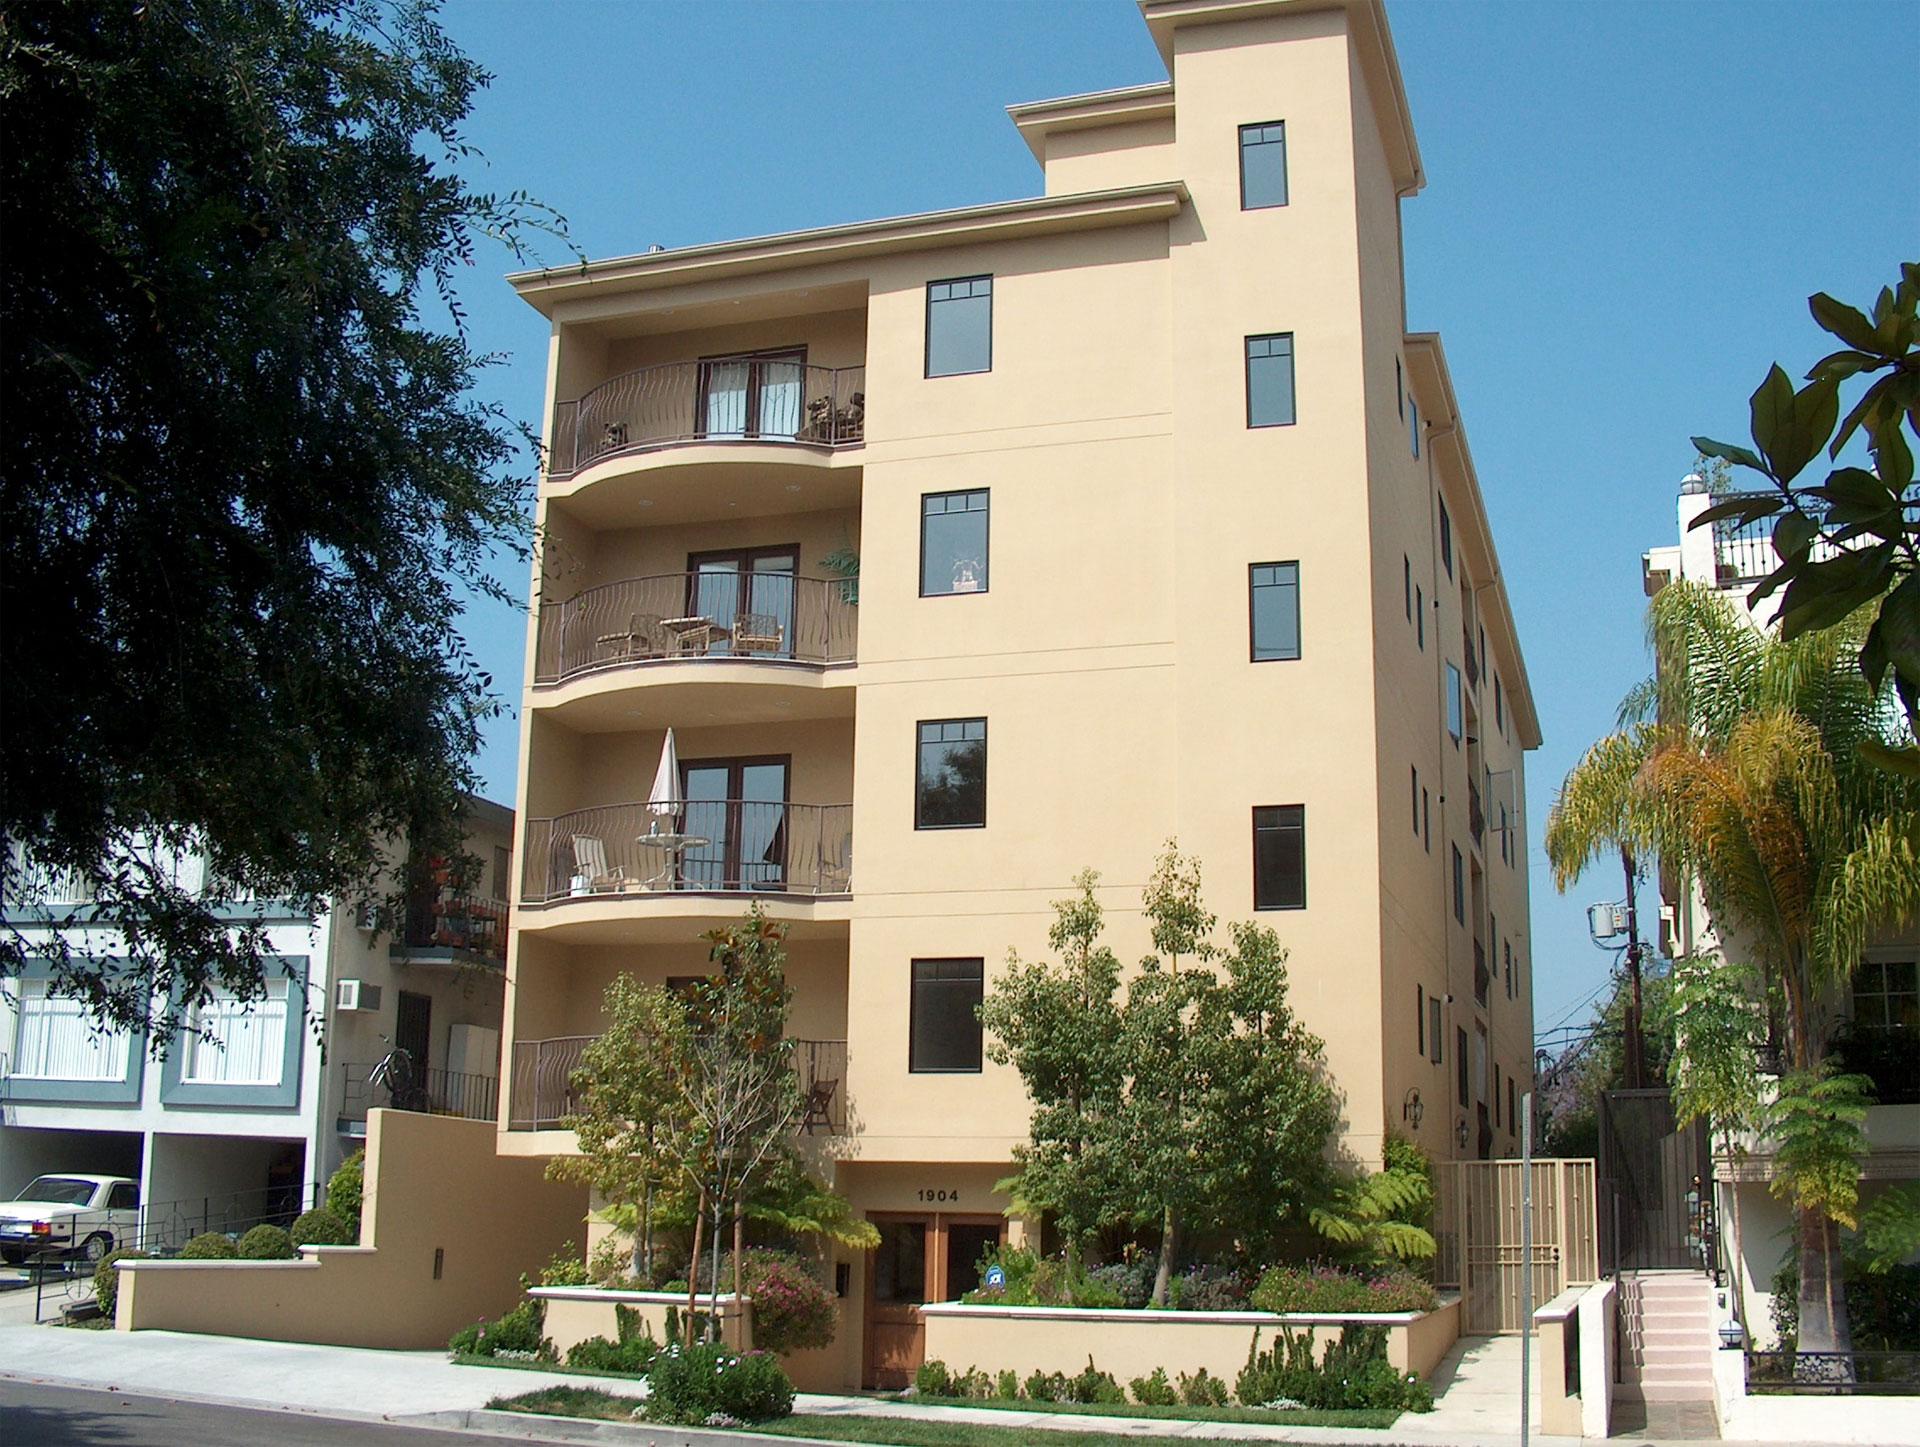 Four-Story Condominium with Semi-Subterranean Parking West